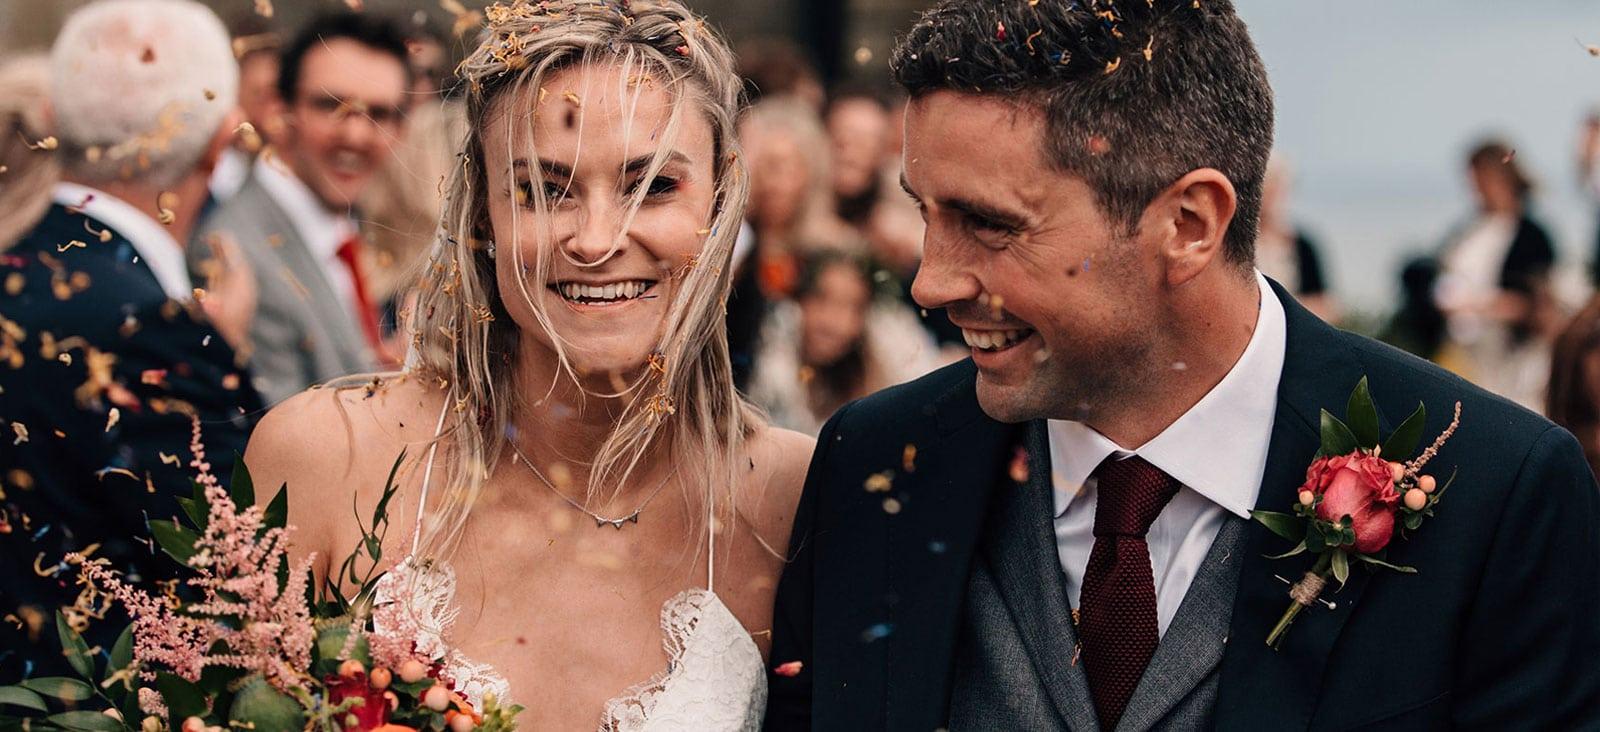 Beach Wedding Photography – Yorkshire